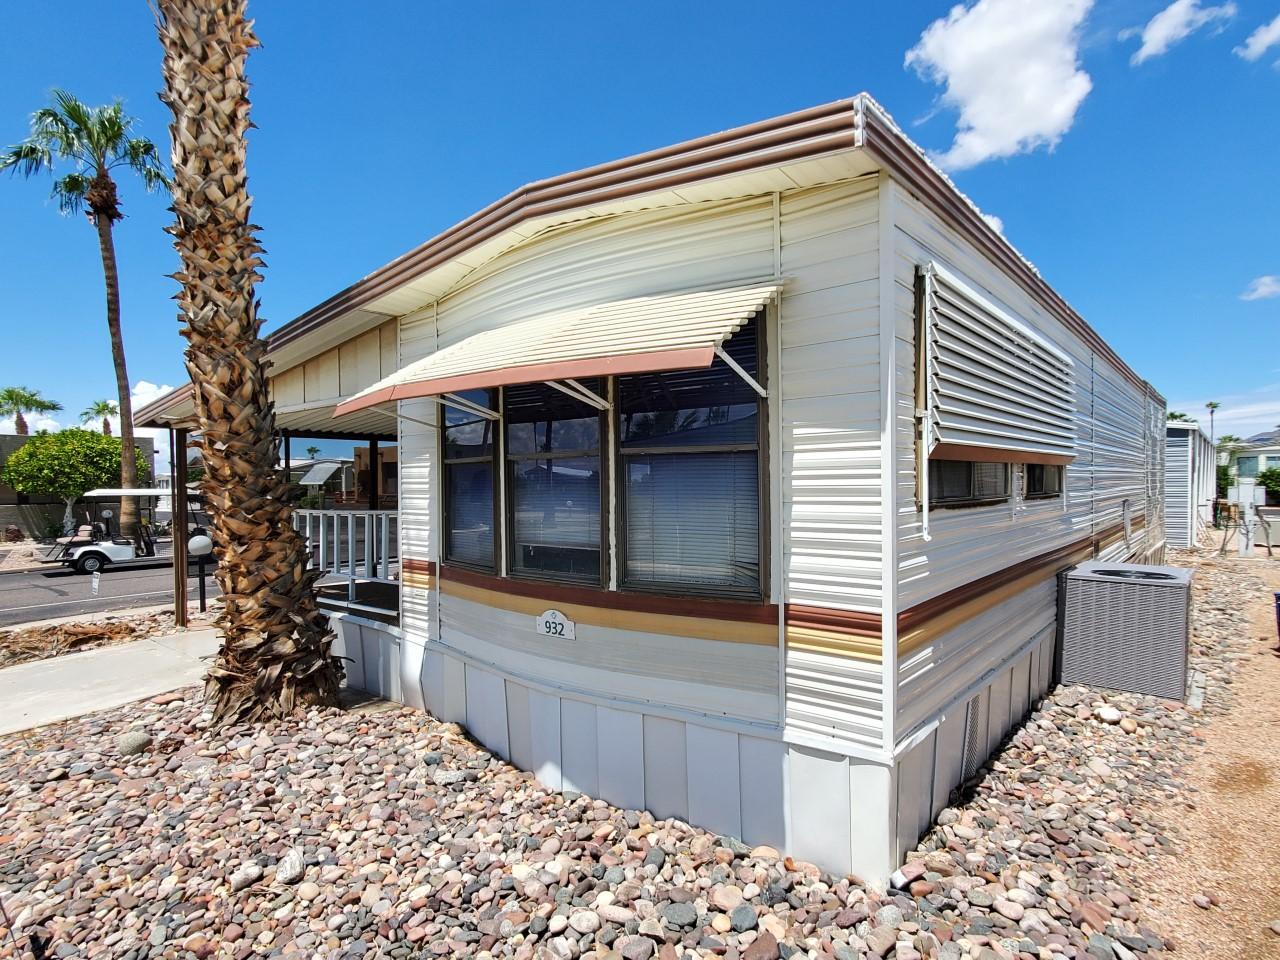 Park Model Home Lot #932